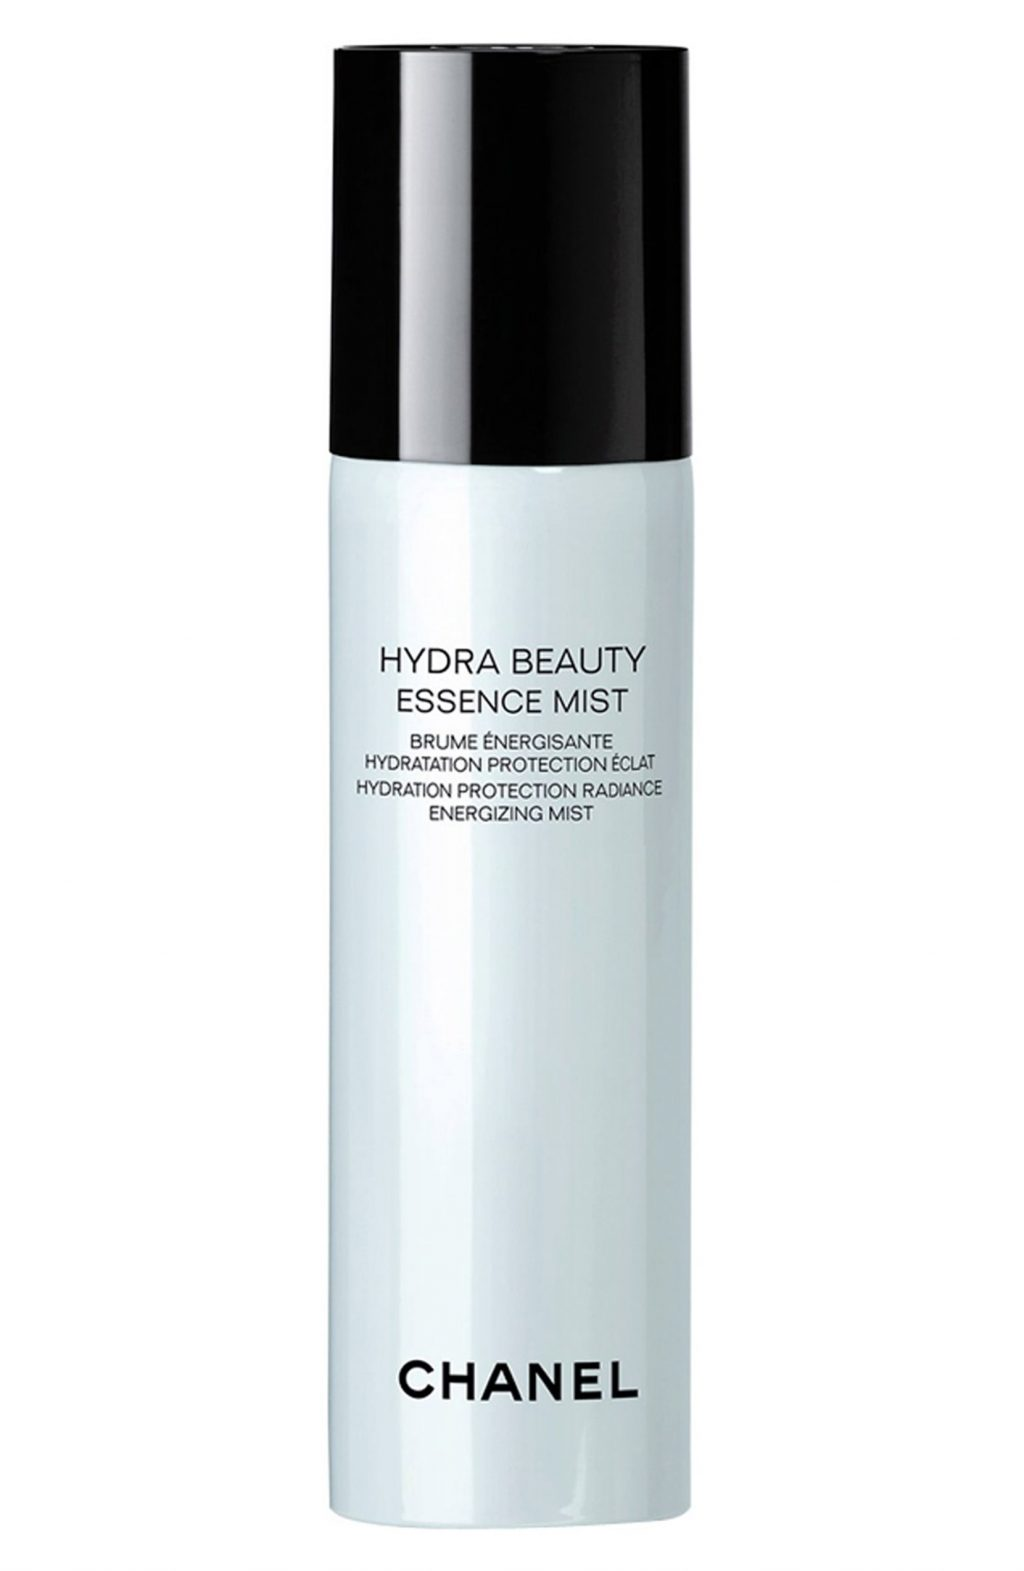 dưỡng da xịt khoáng Chanel Hydra Beauty Essence Mist